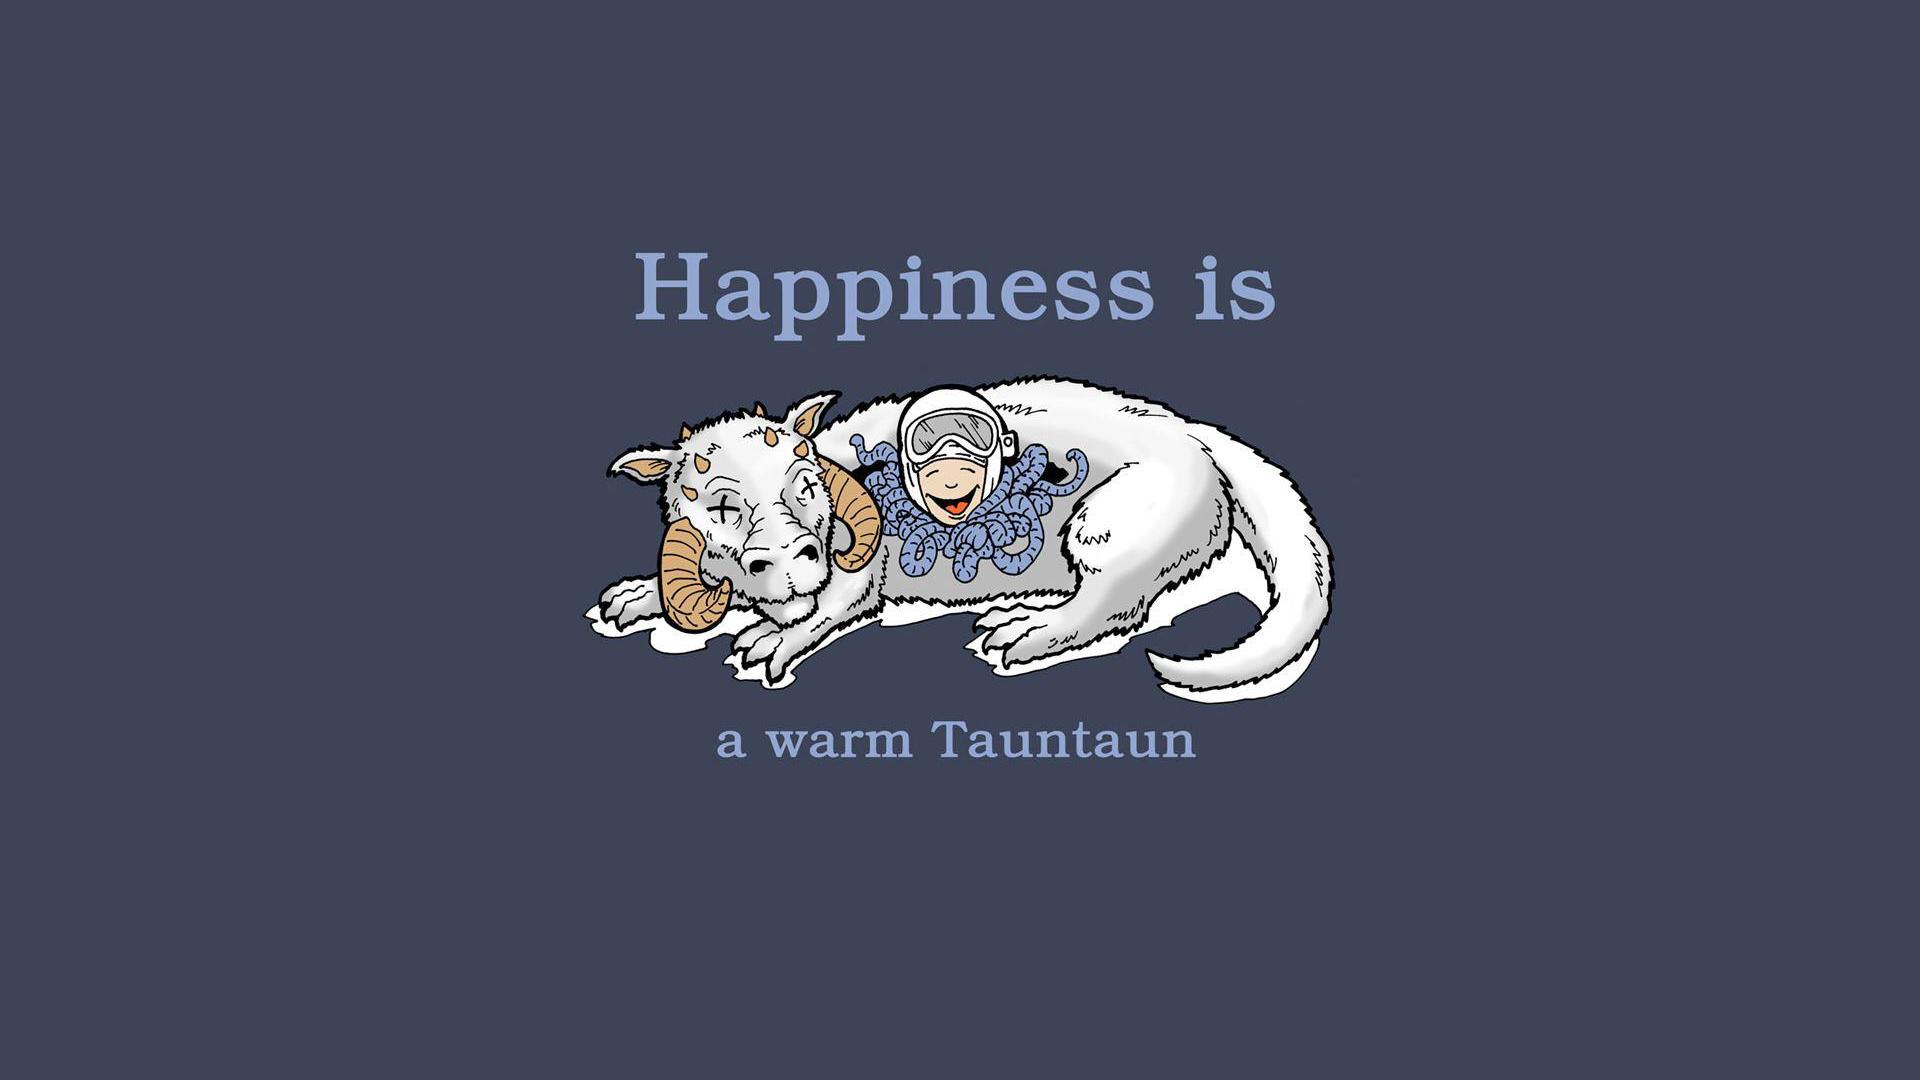 Star Wars Wallpapers Star Wars Tauntaun Shirt 1920x1080 Wallpaper Teahub Io